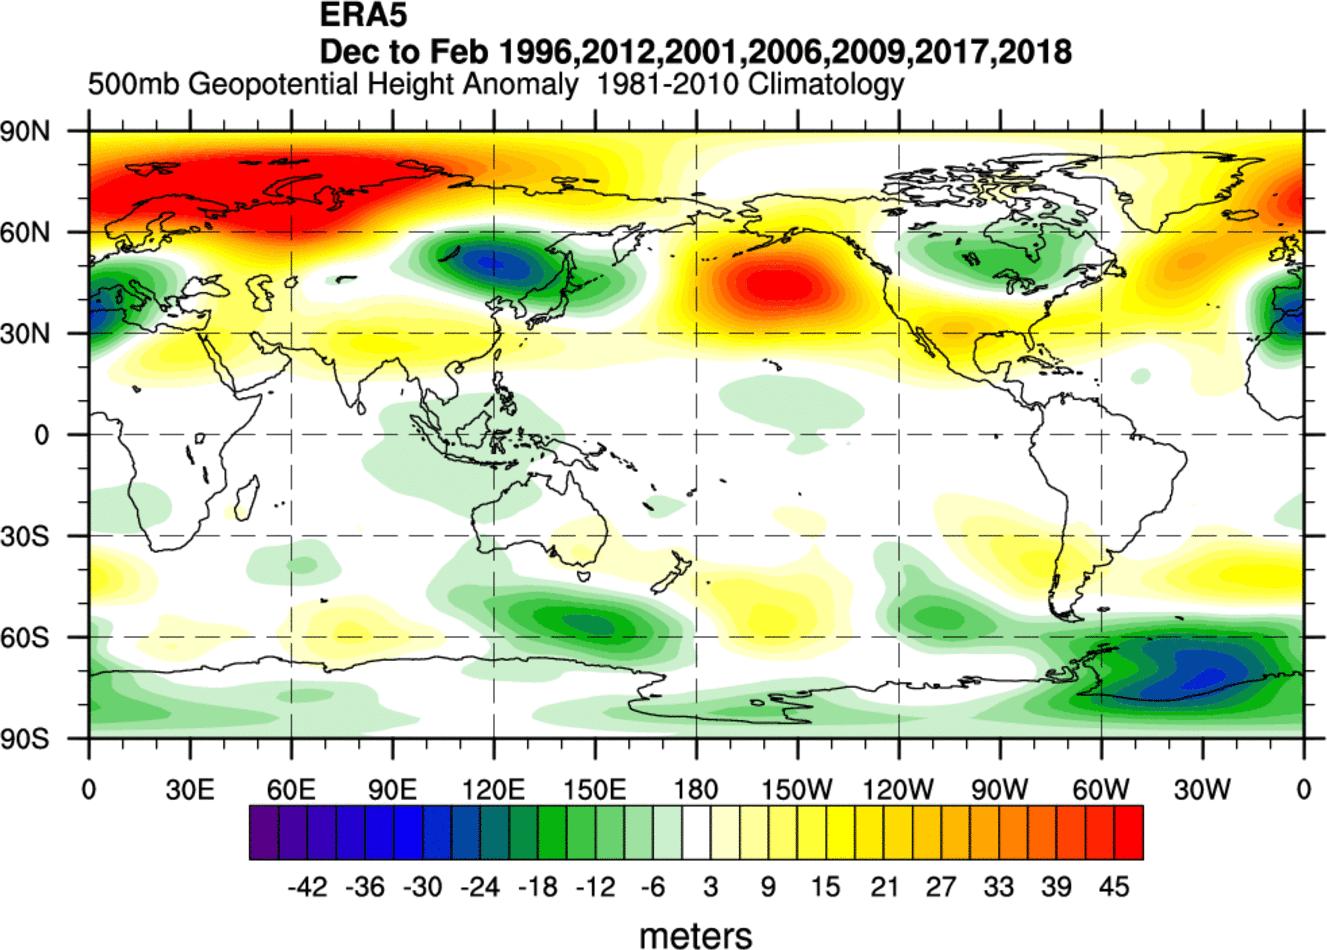 winter-forecast-weather-season-la-nina-pressure-history-reanalysis